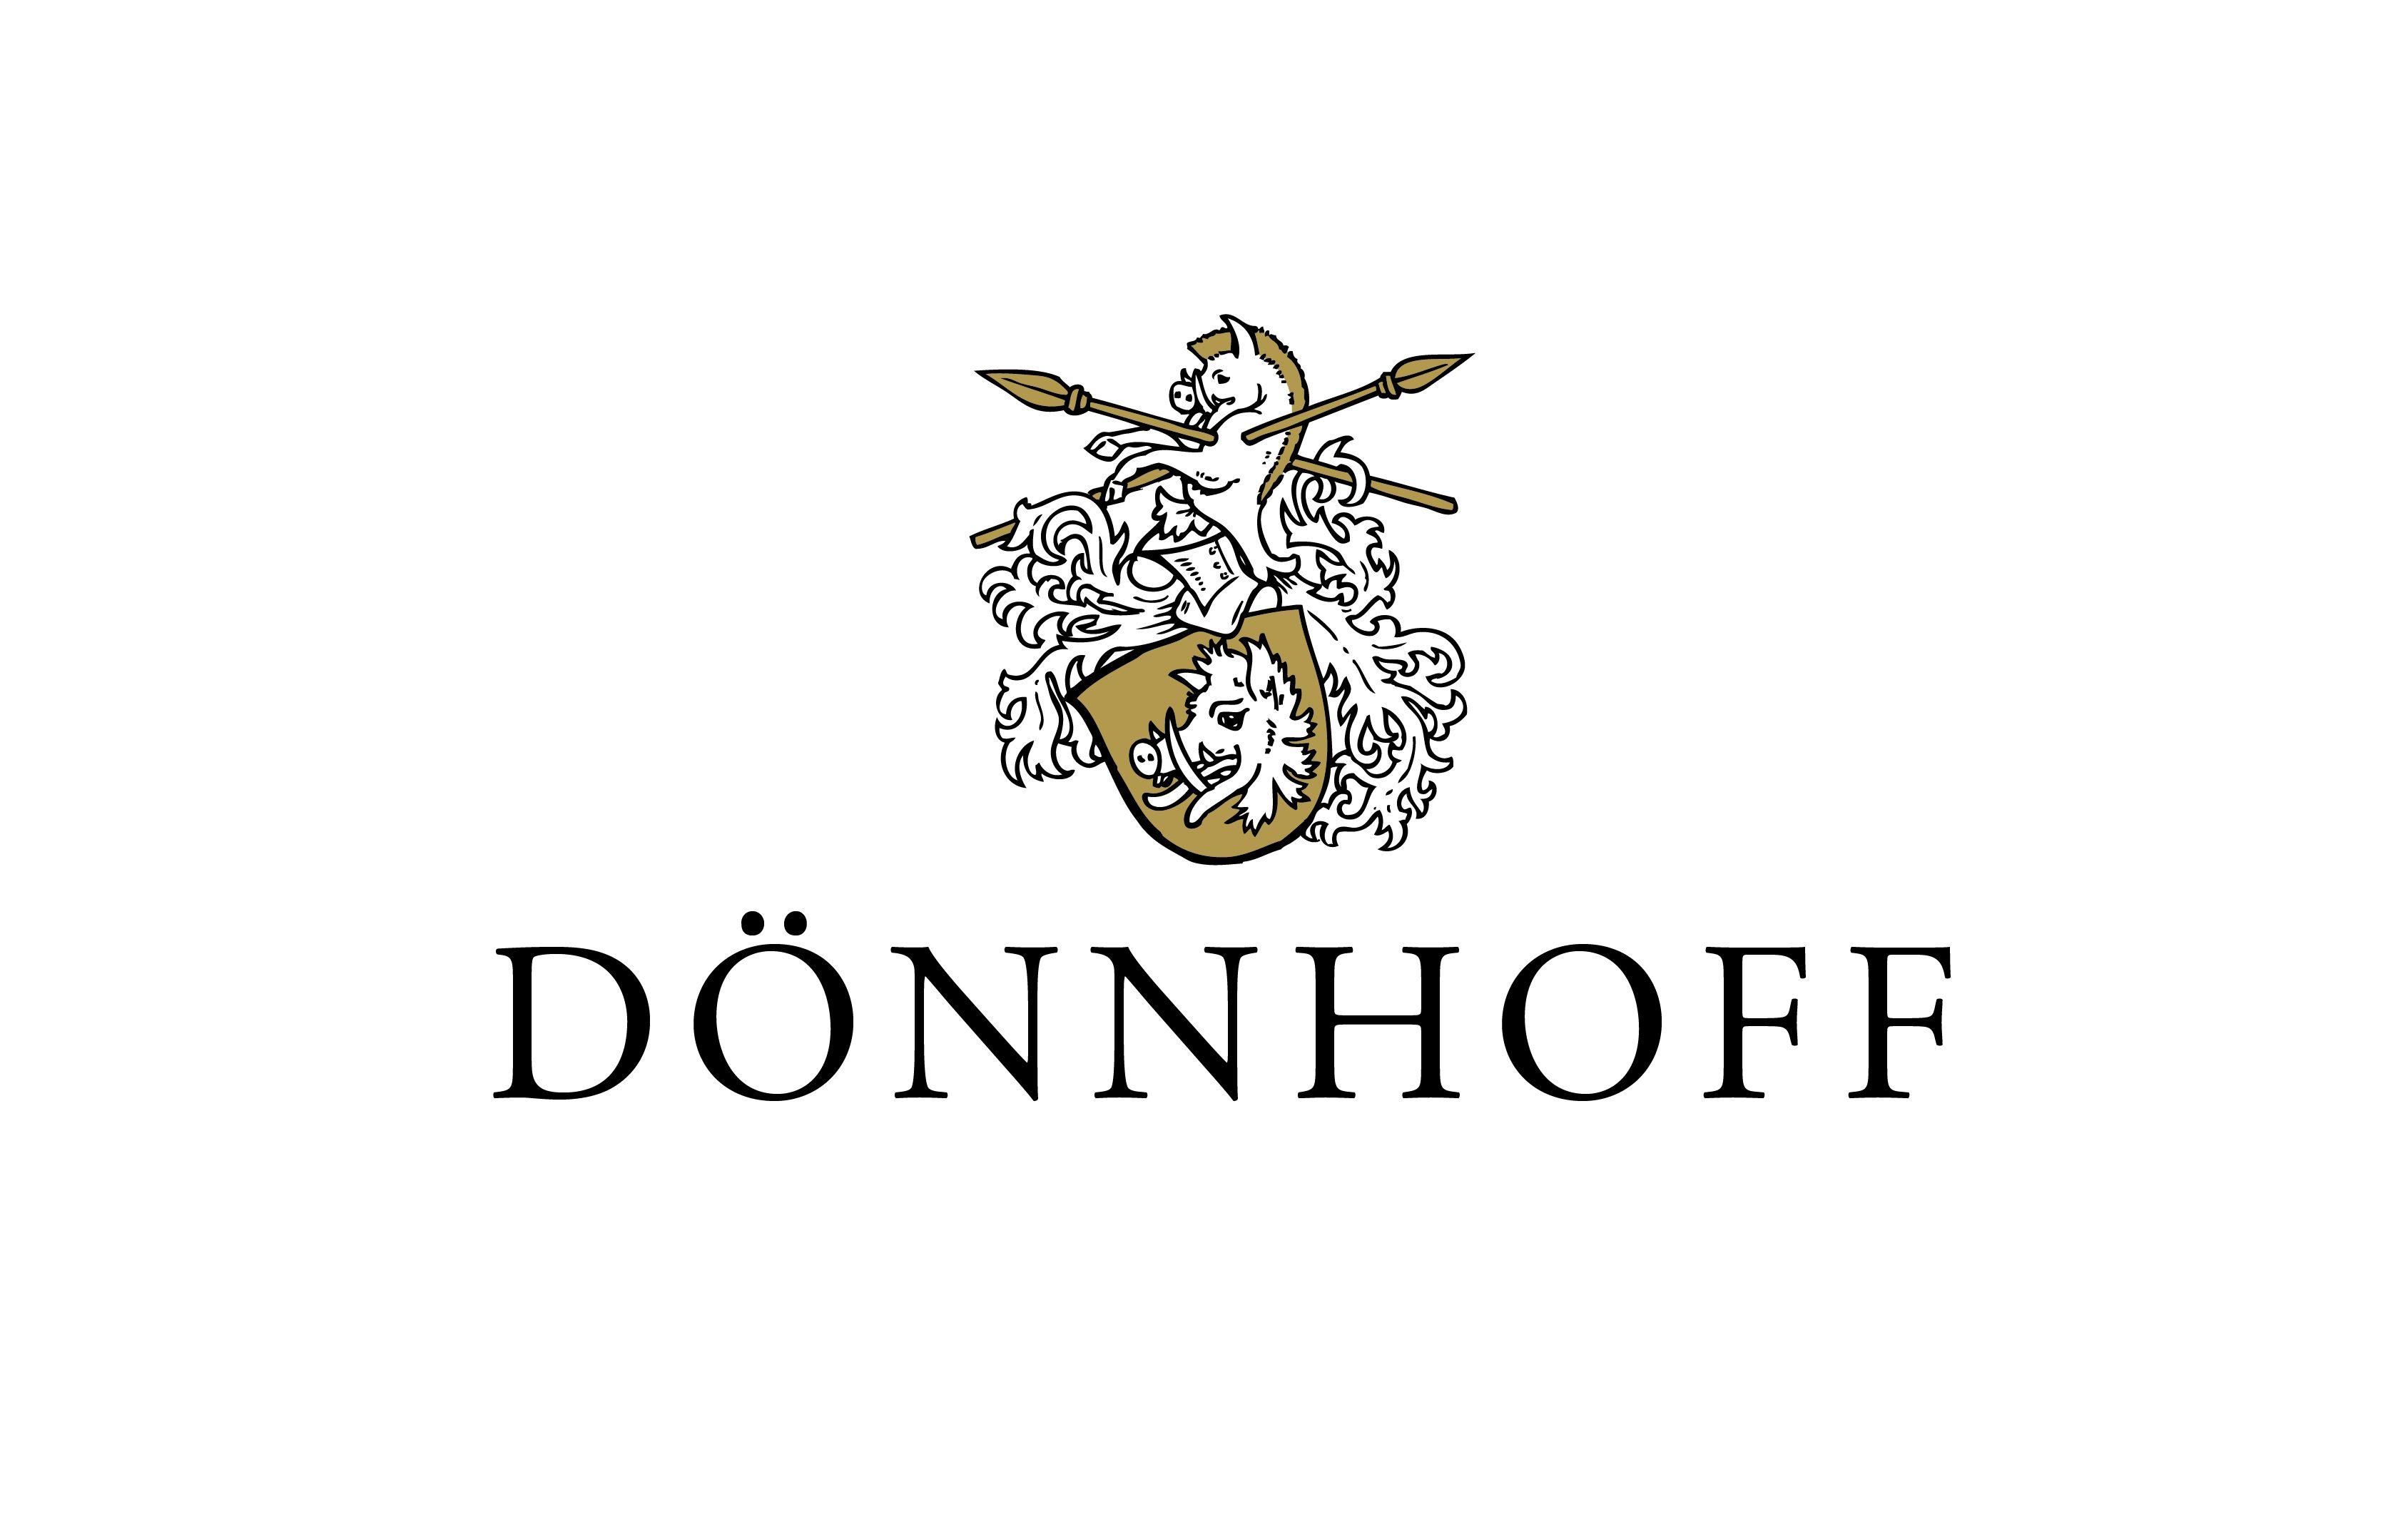 H. DÖNNHOFF (VDP - Nahe)